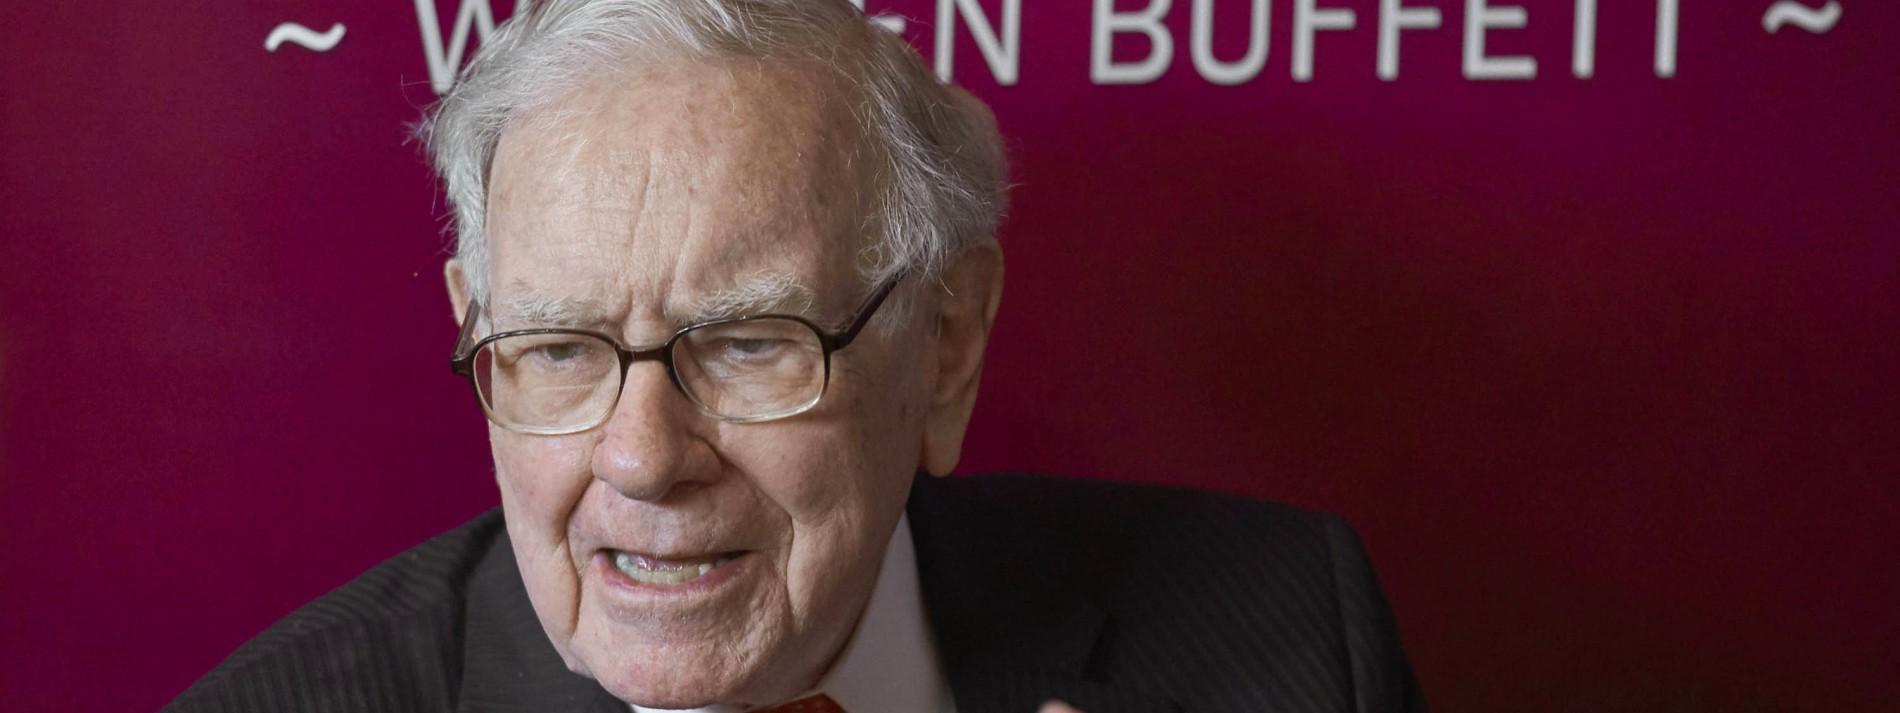 Warren Buffetts Investmentfirma mit hohem Gewinn